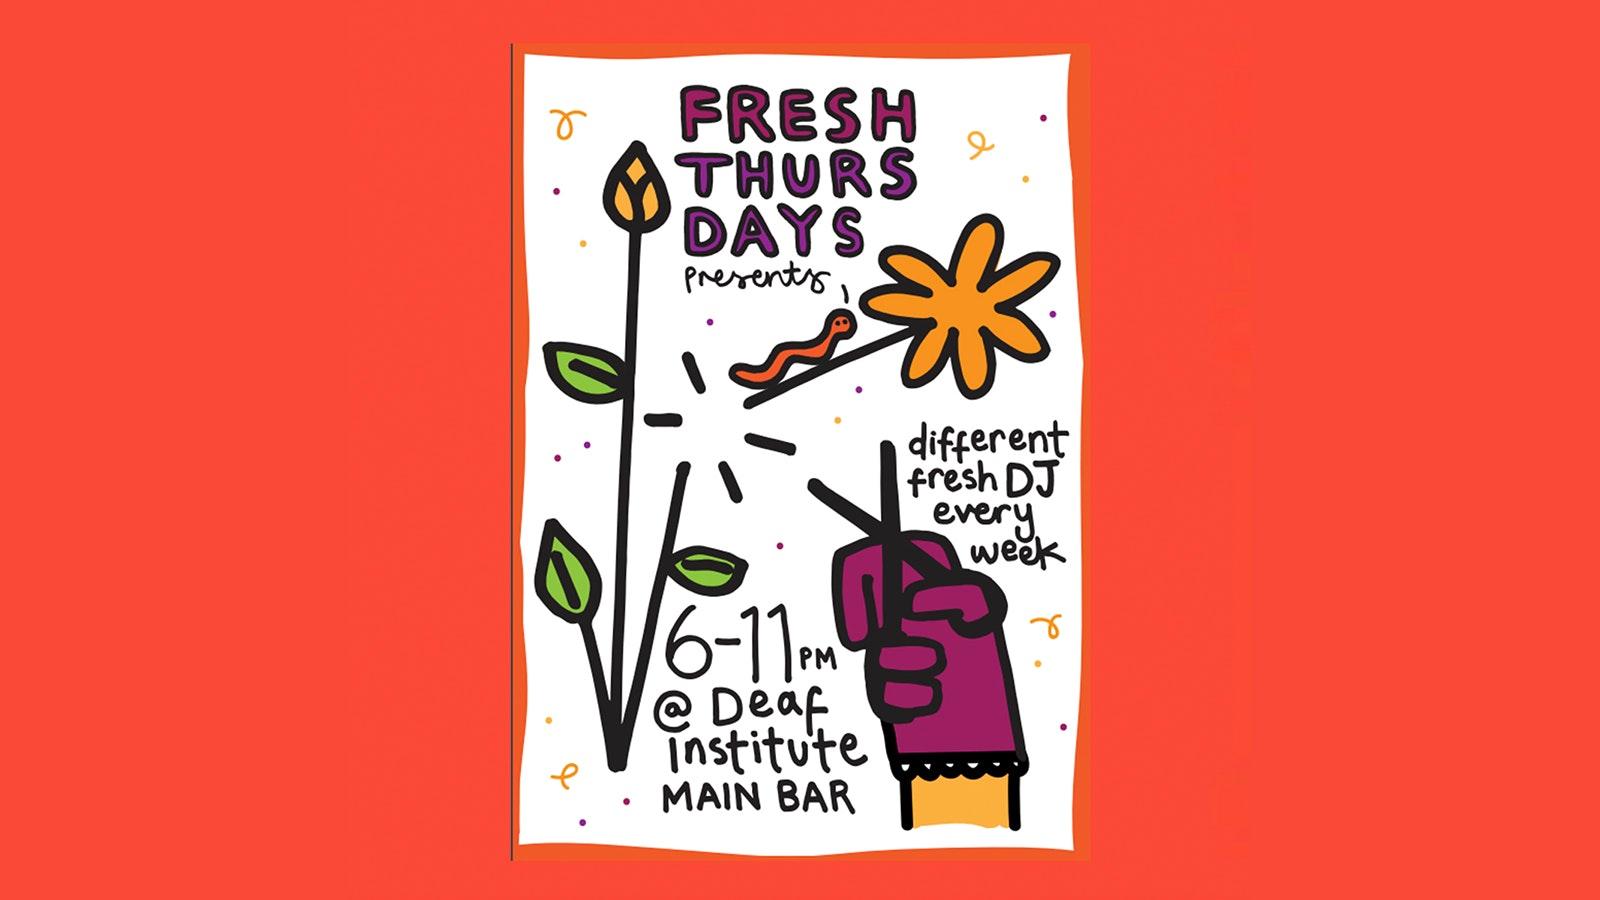 FRESH THURSDAYS PRESENTS … ALL HANDS ON DECK